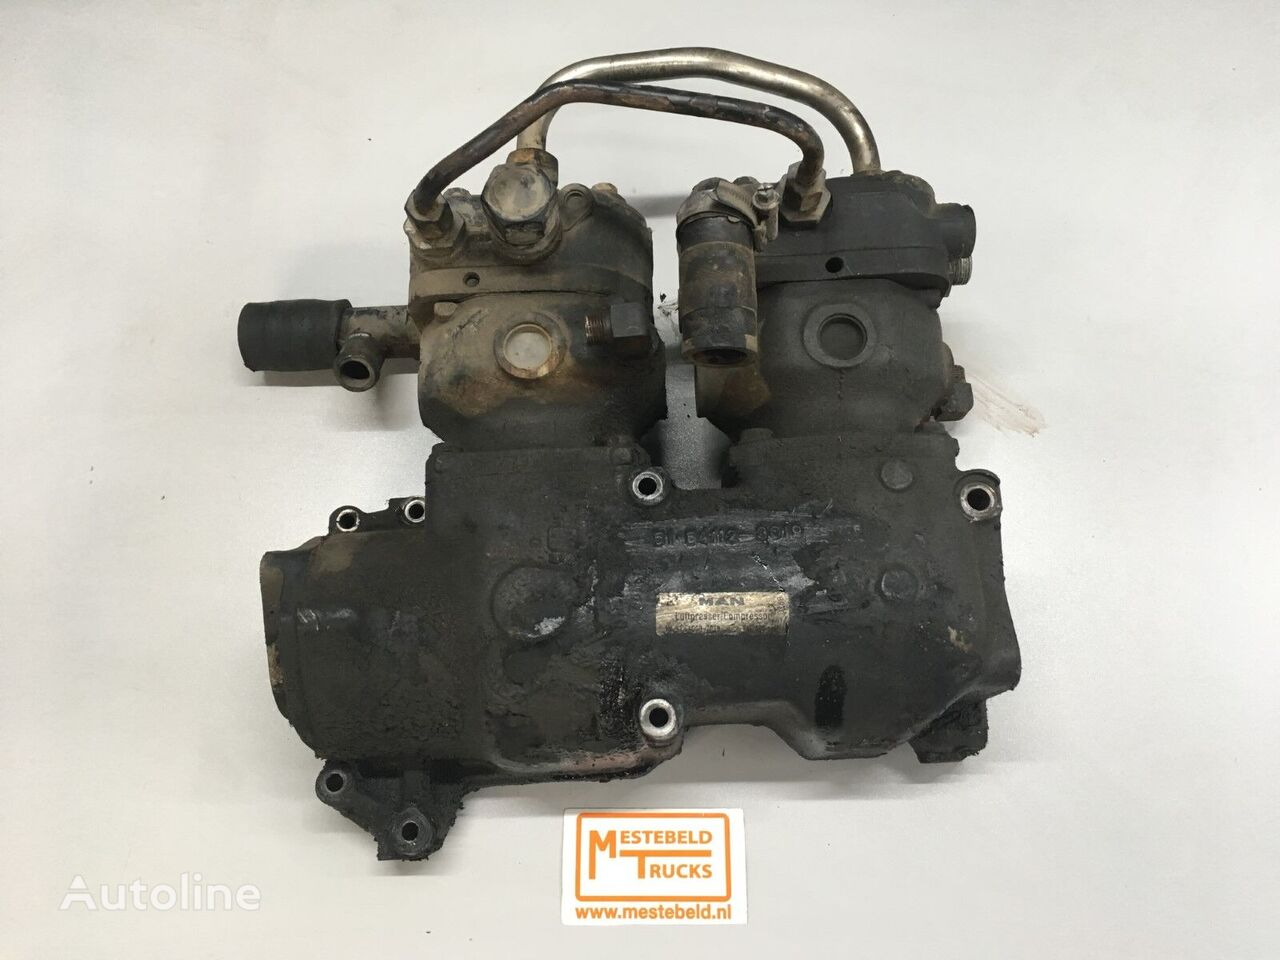 MAN pneumatic compressor for truck